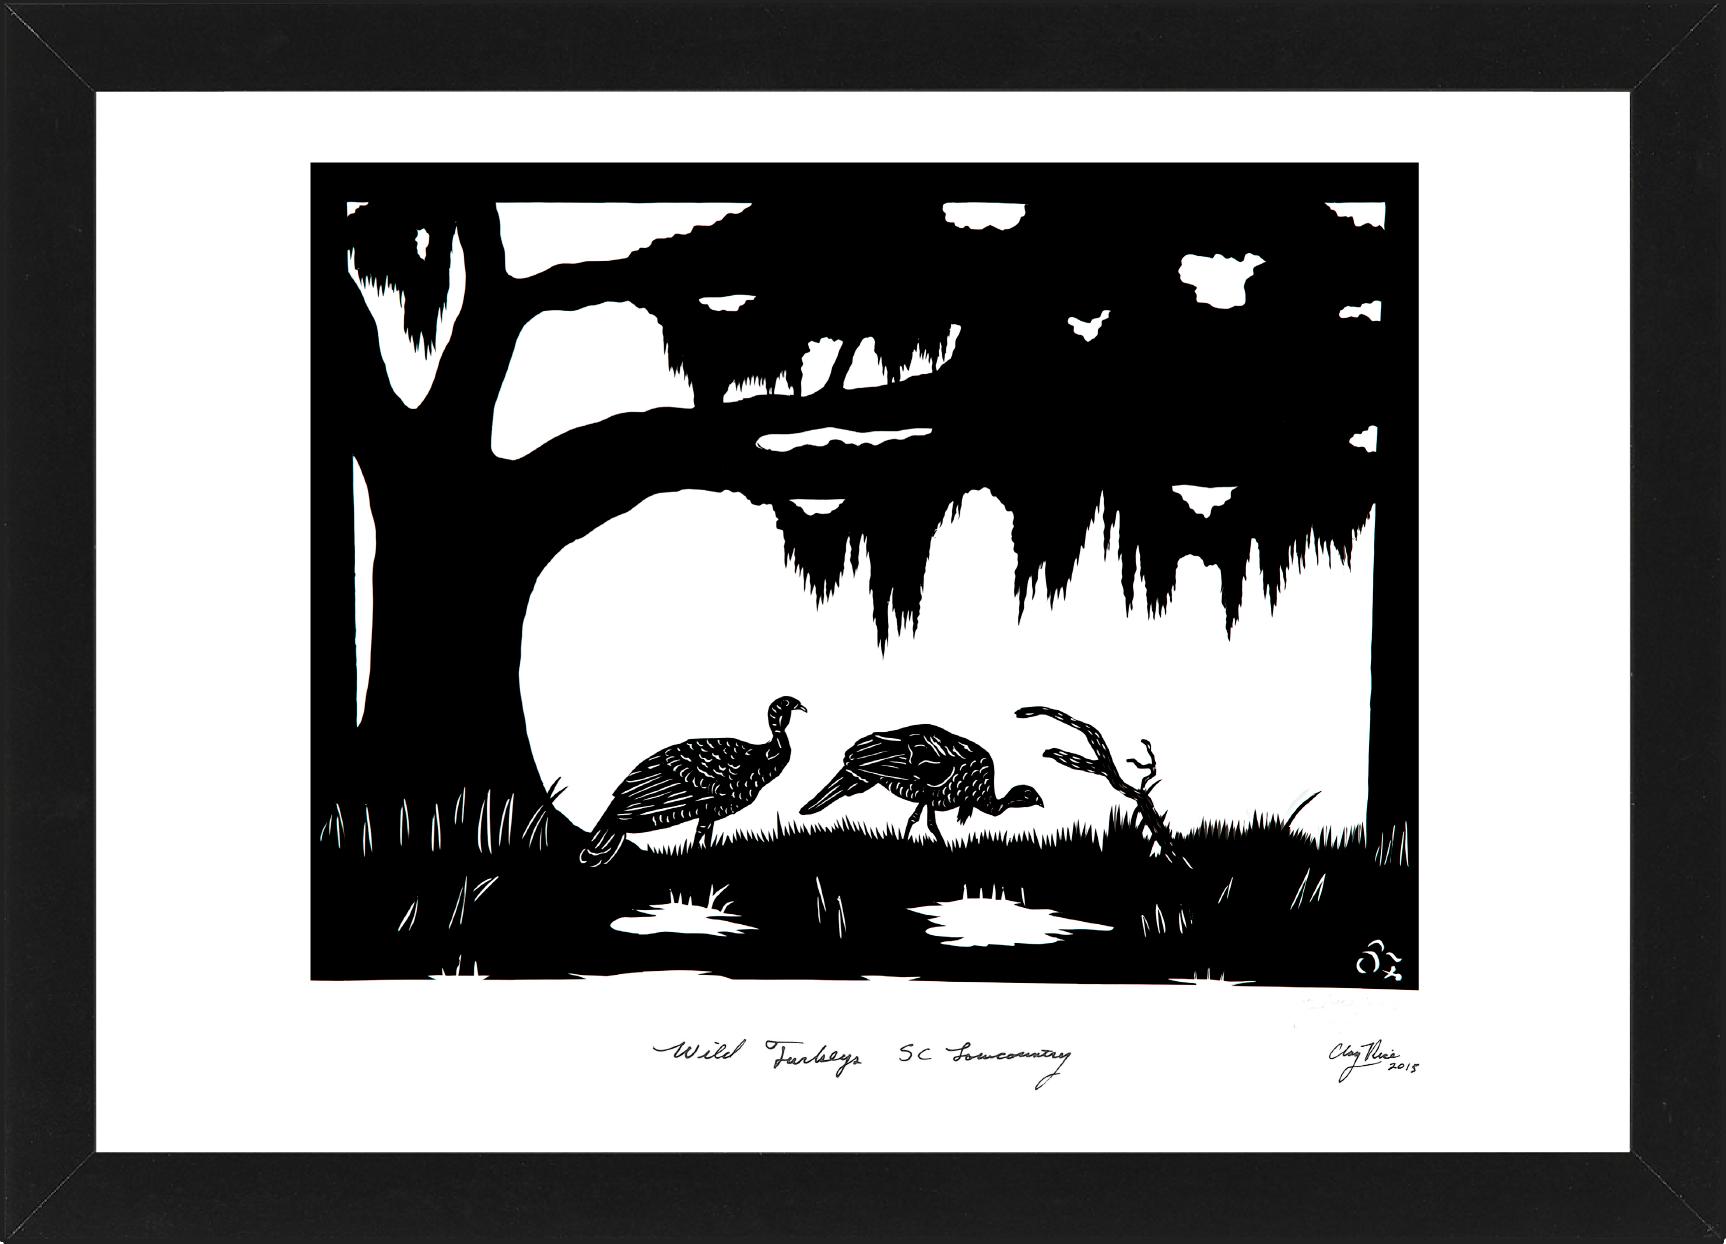 silhouette of two turkeys under a tree